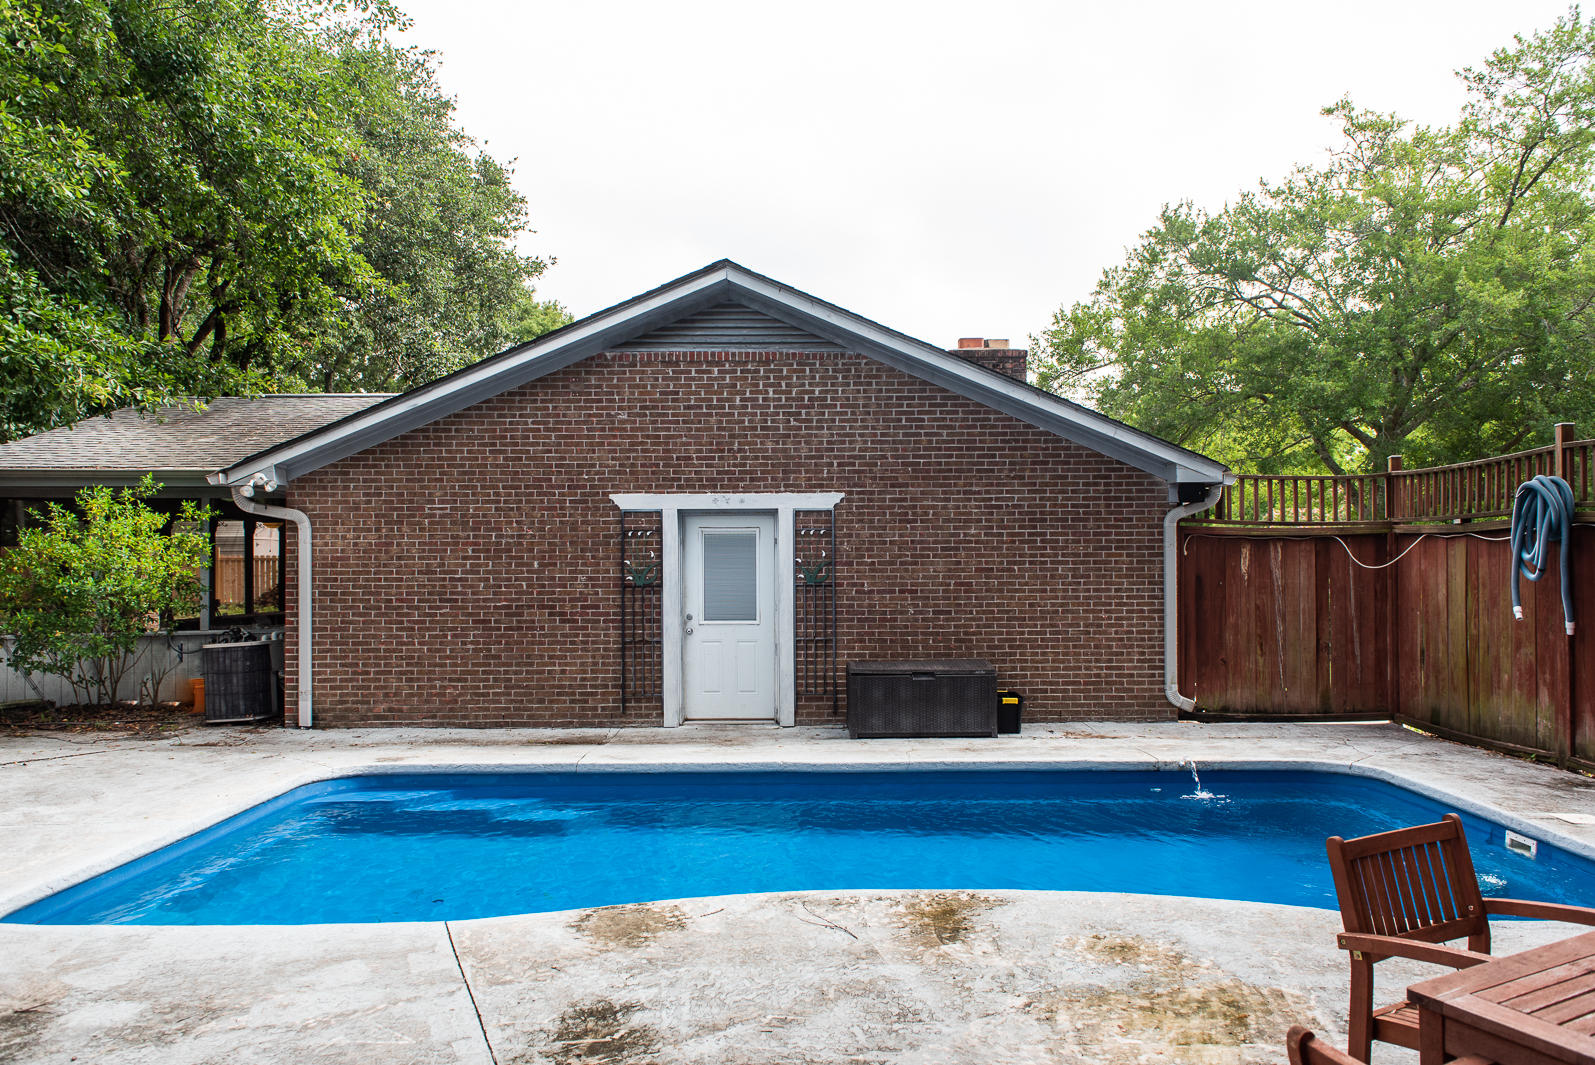 Wando East Homes For Sale - 1605 Babington, Mount Pleasant, SC - 2